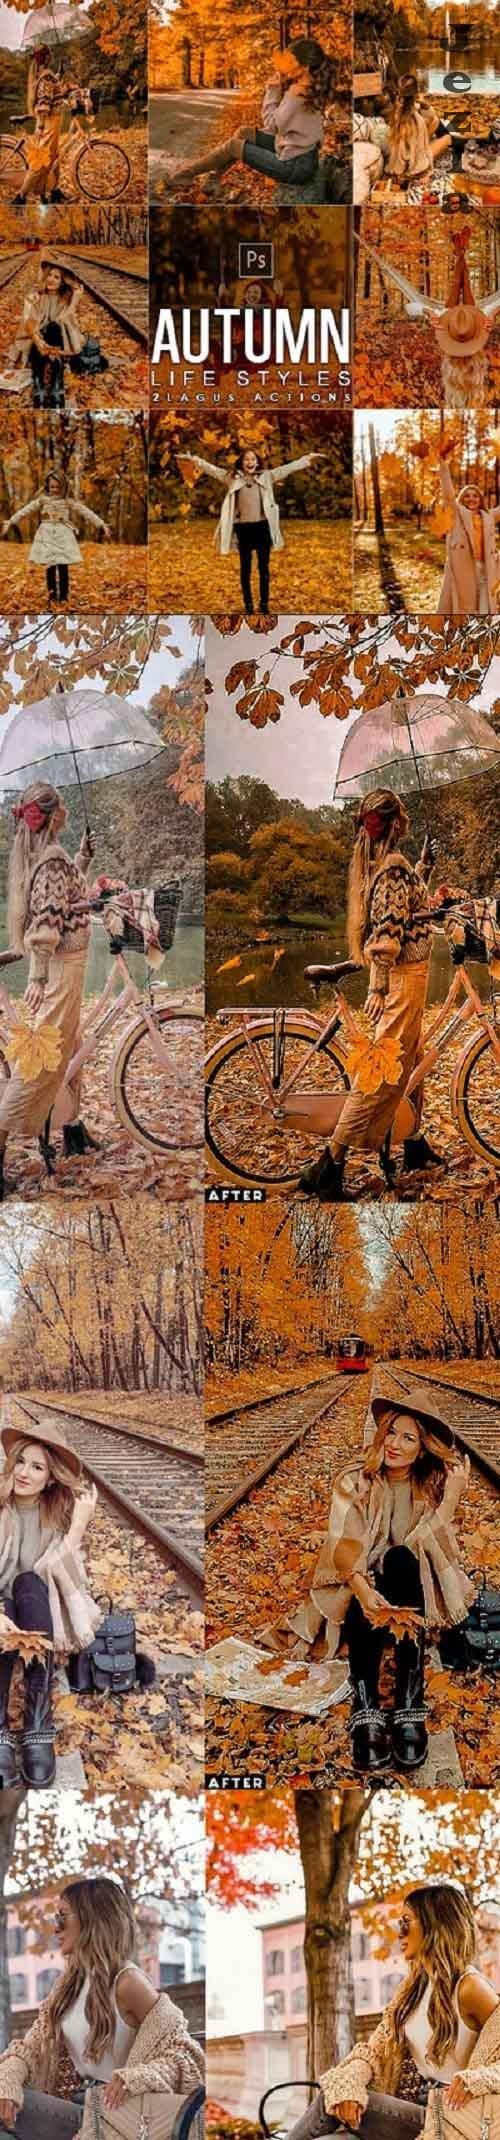 Autumn Lifestyles Photoshop Actions - 28885903